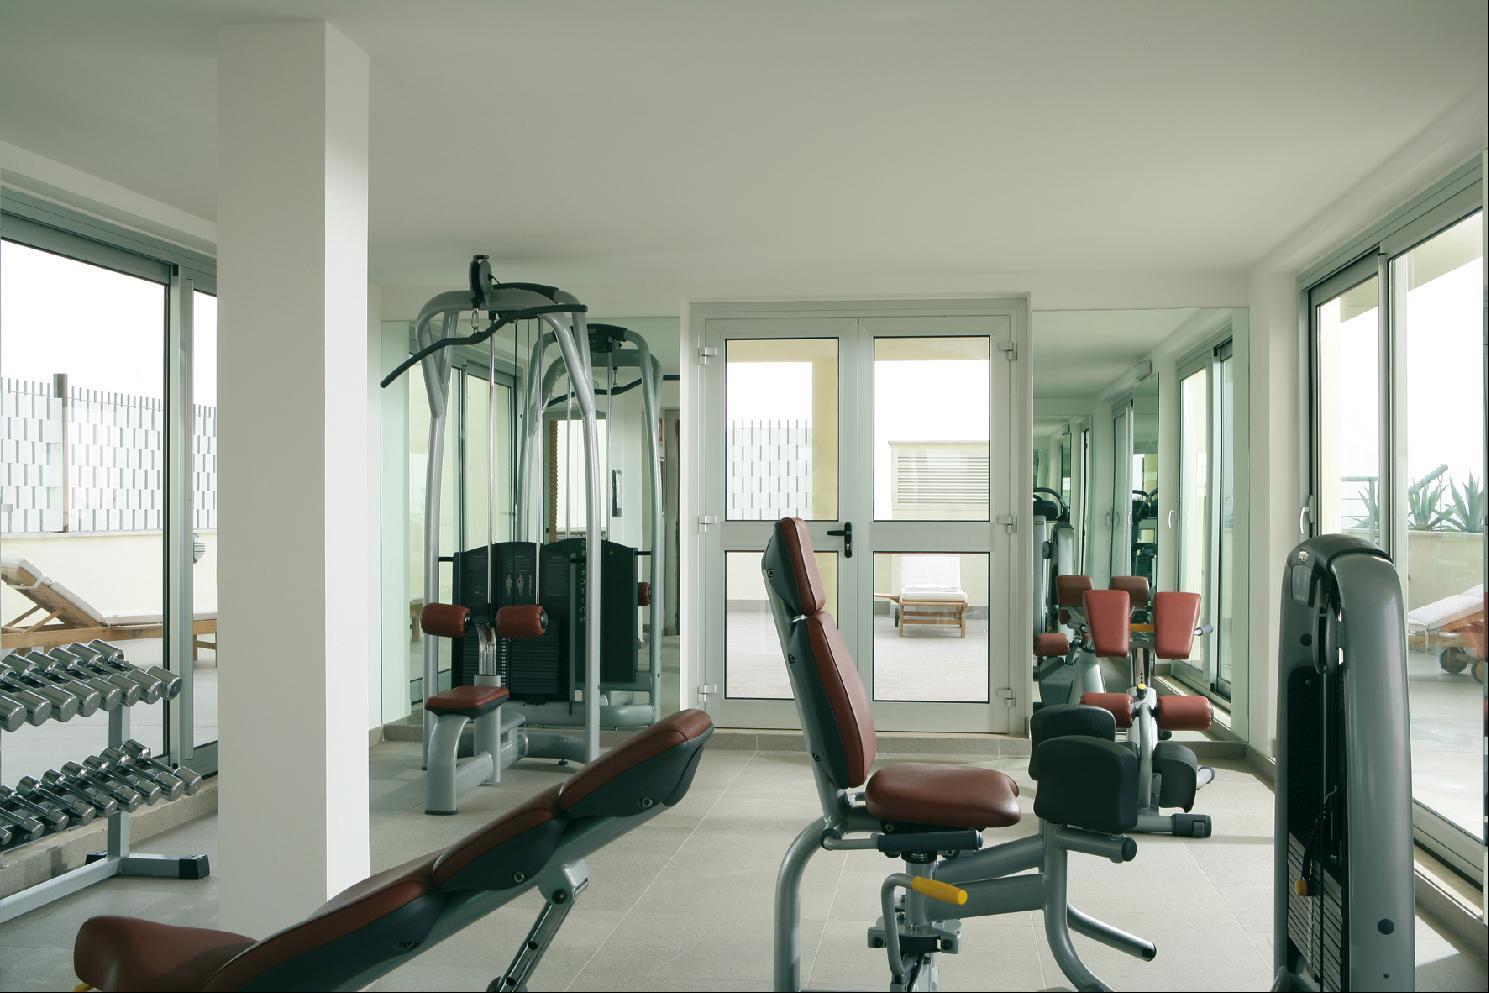 ARAN BLU HOTEL • LIDO DI OSTIA • 4⋆ ITALY • RATES FROM €106